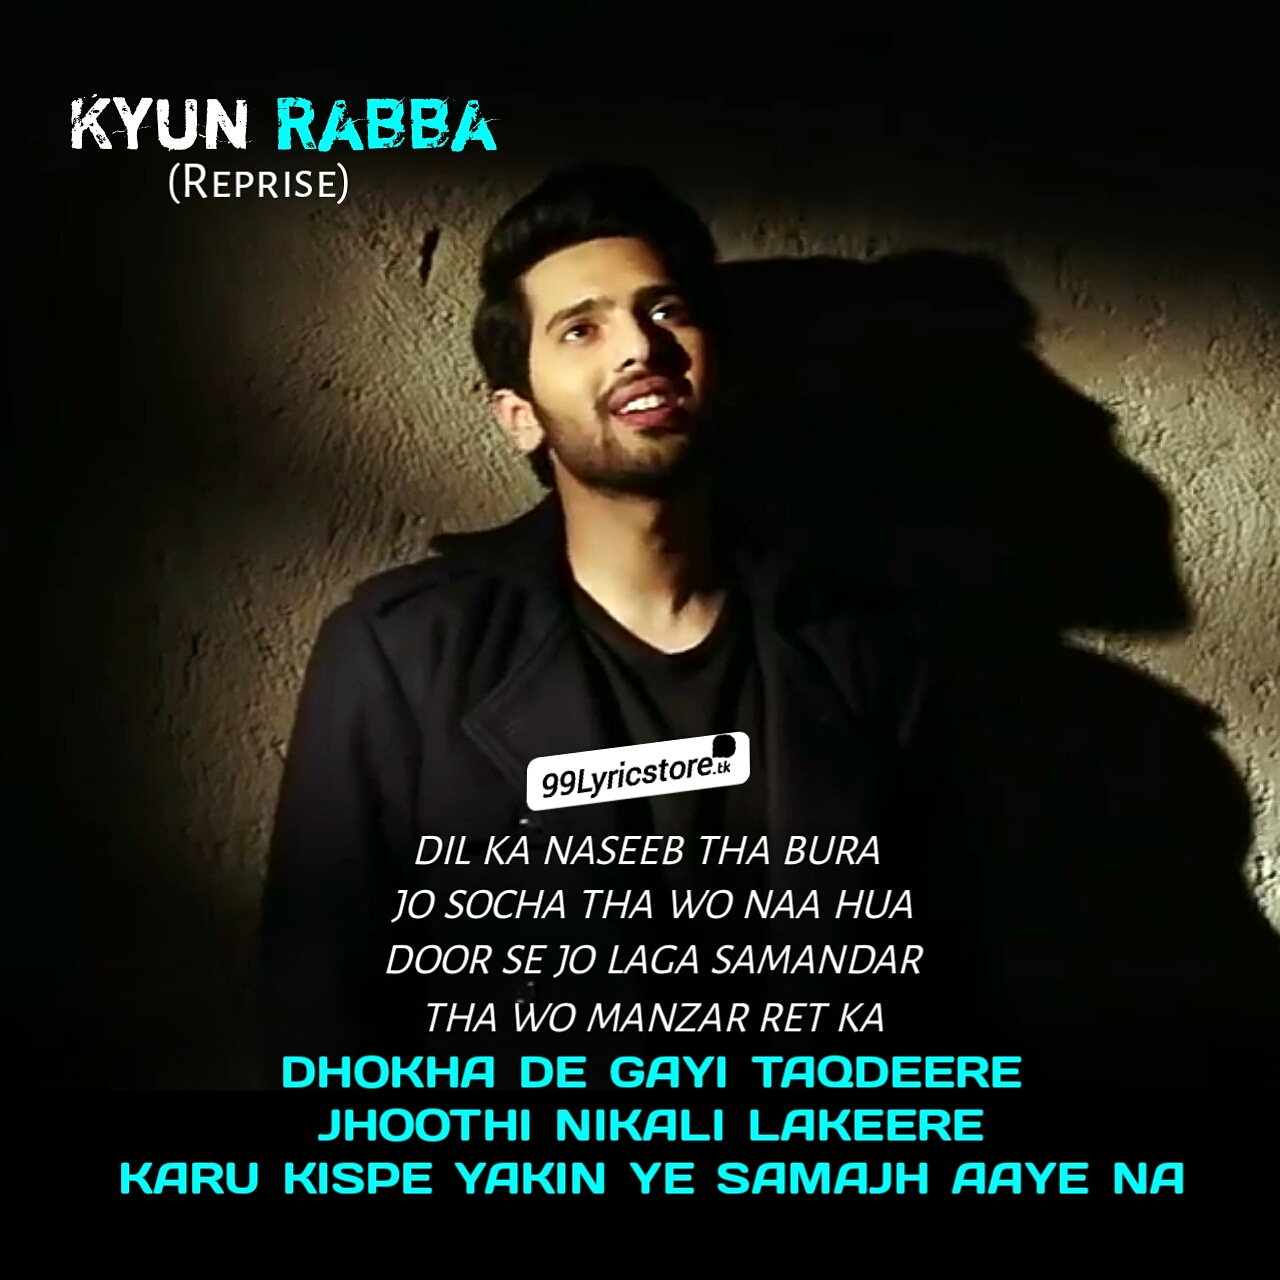 Kyun Rabba reprise lyrics sung by armaan malik